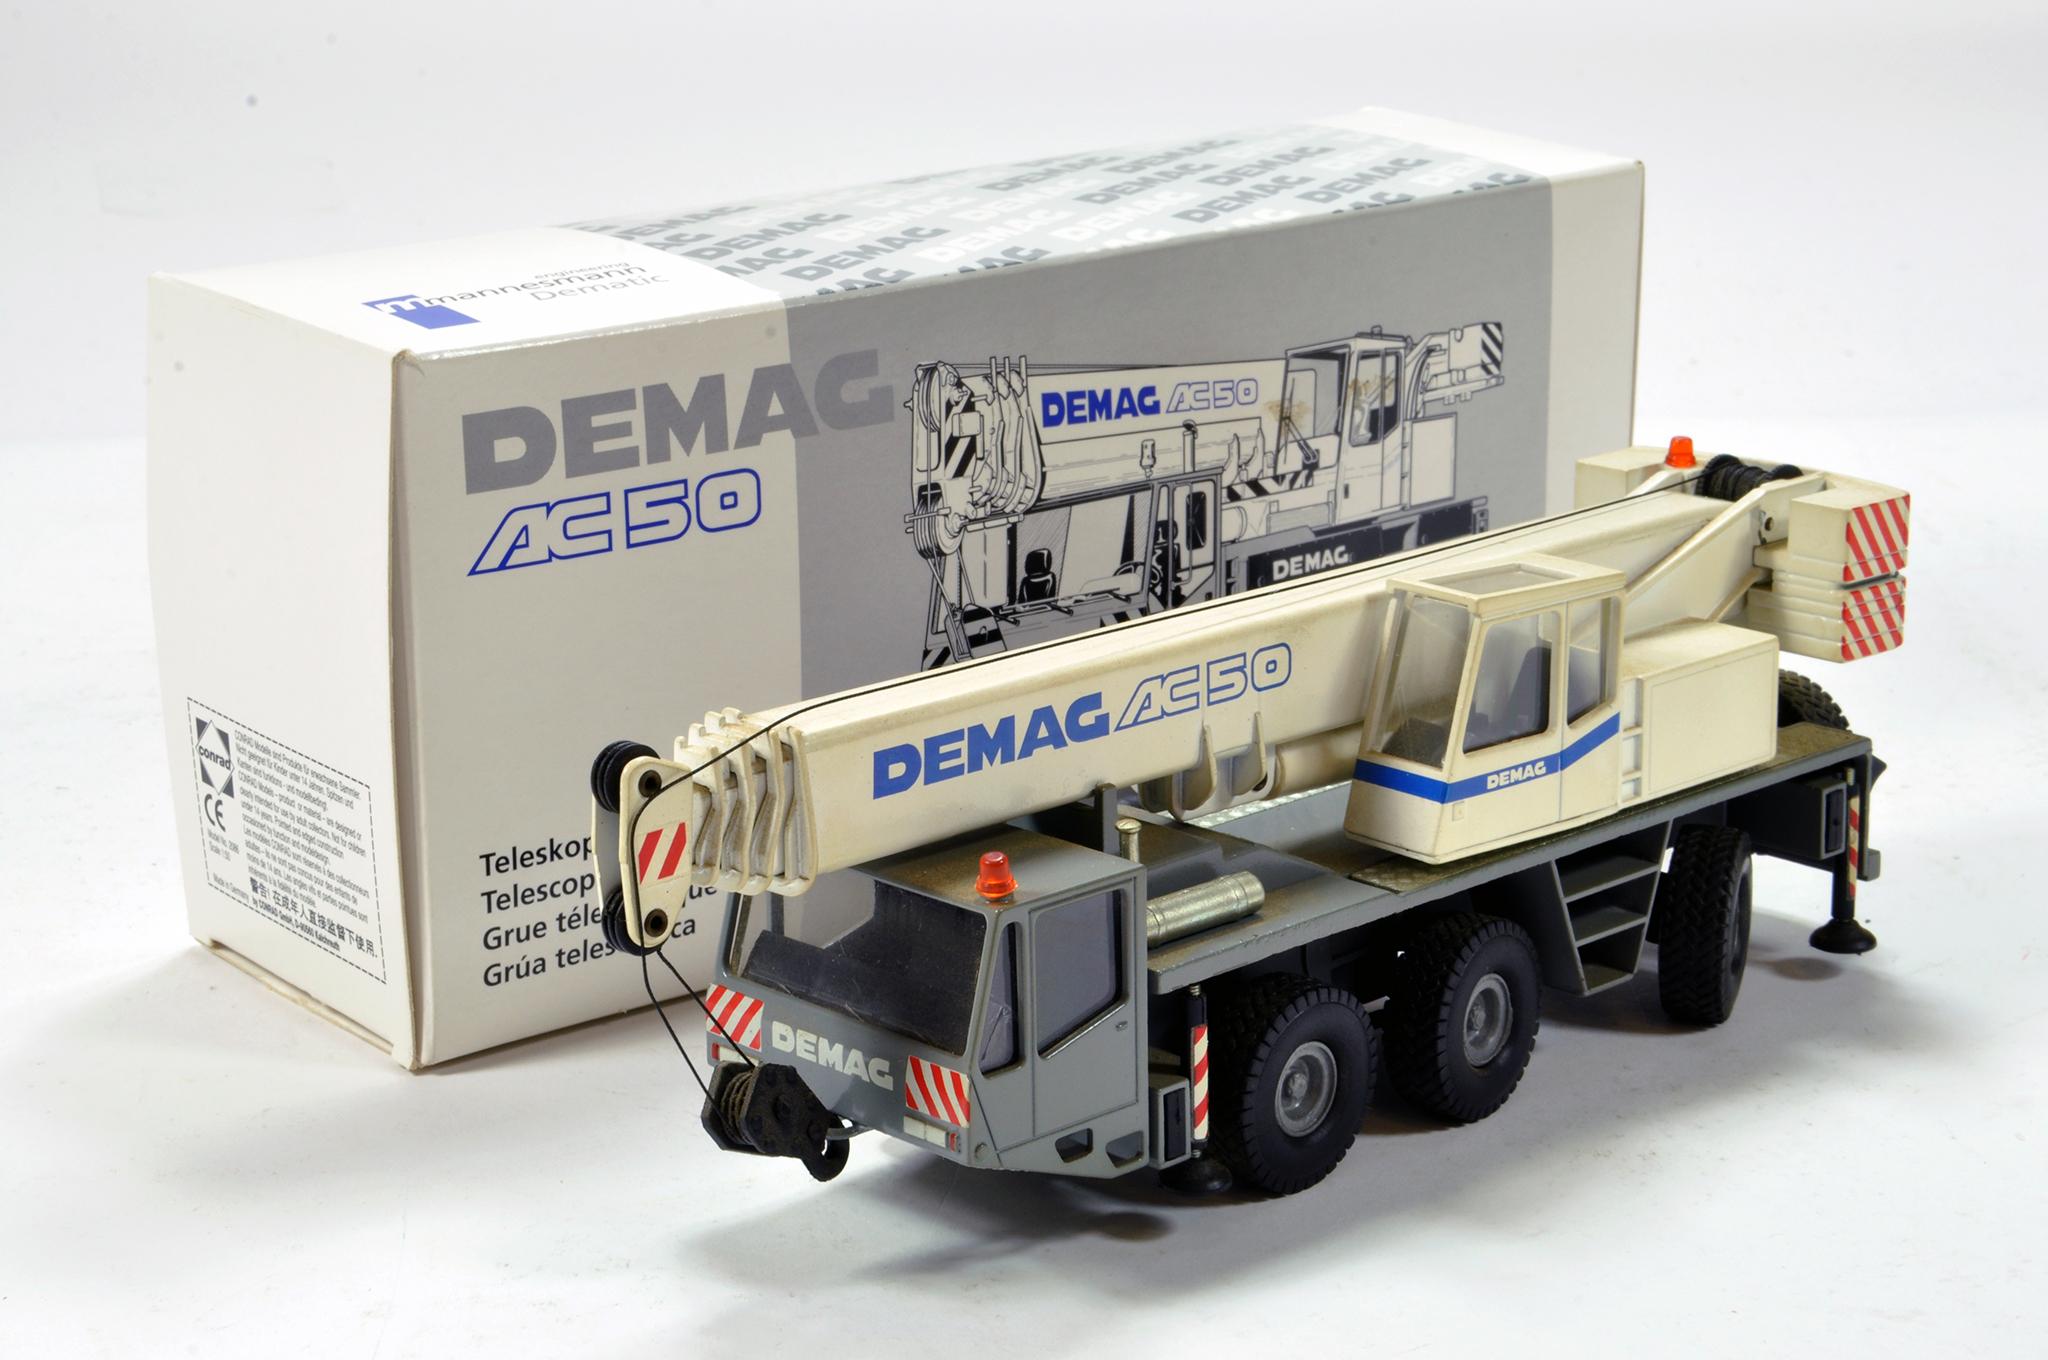 Lot 350 - Conrad 1/50 construction issue comprising Demag AC50 Mobile Crane. E to NM.